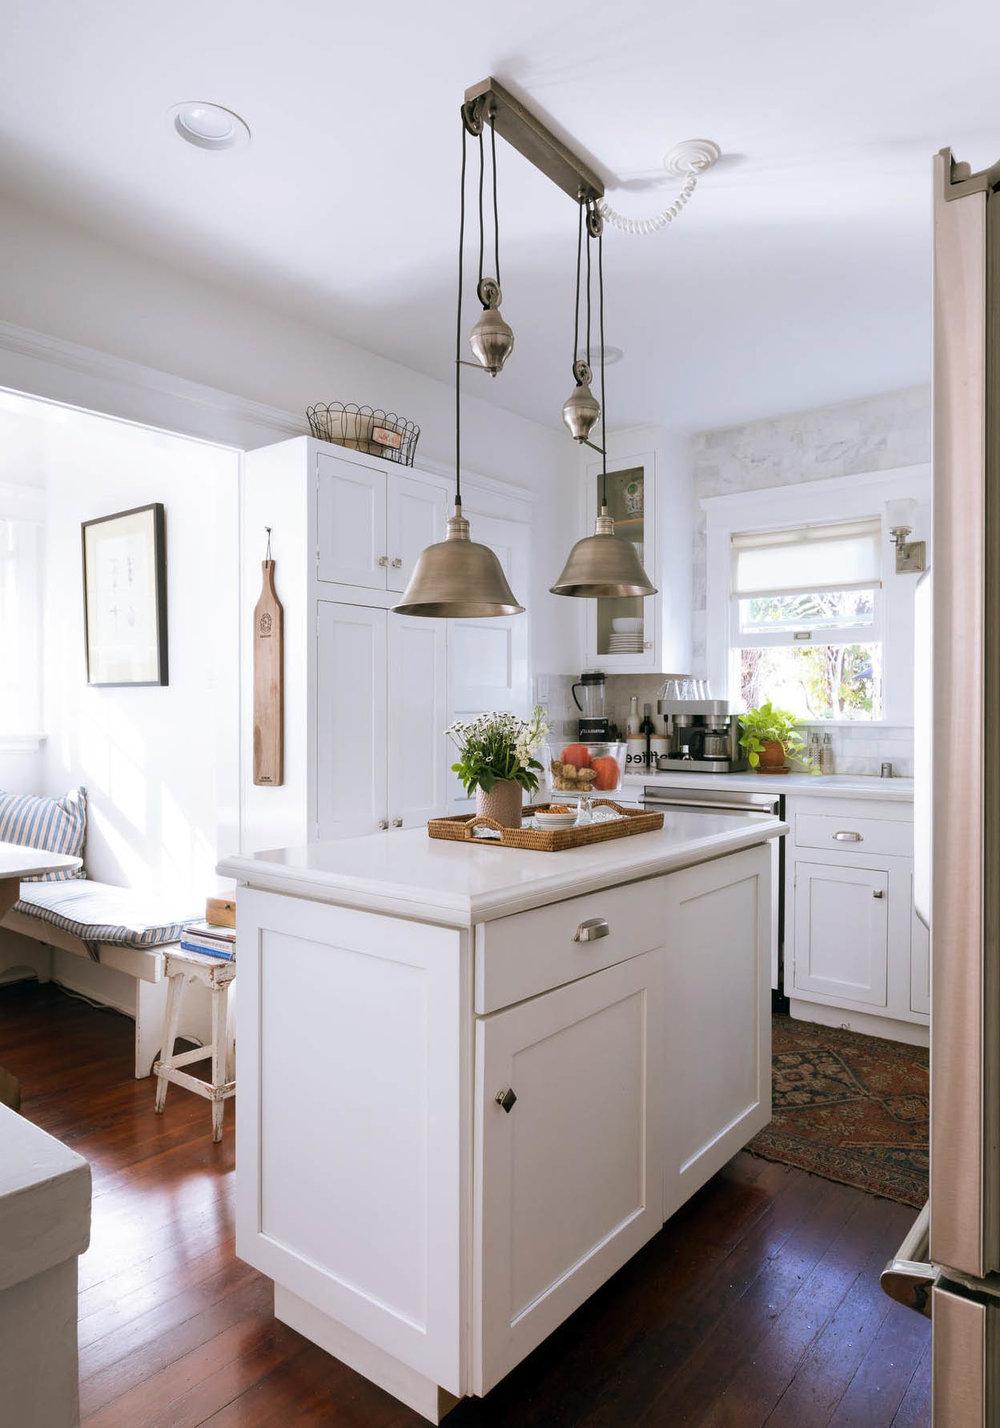 Rustic Farmhouse Kitchen 4.jpg